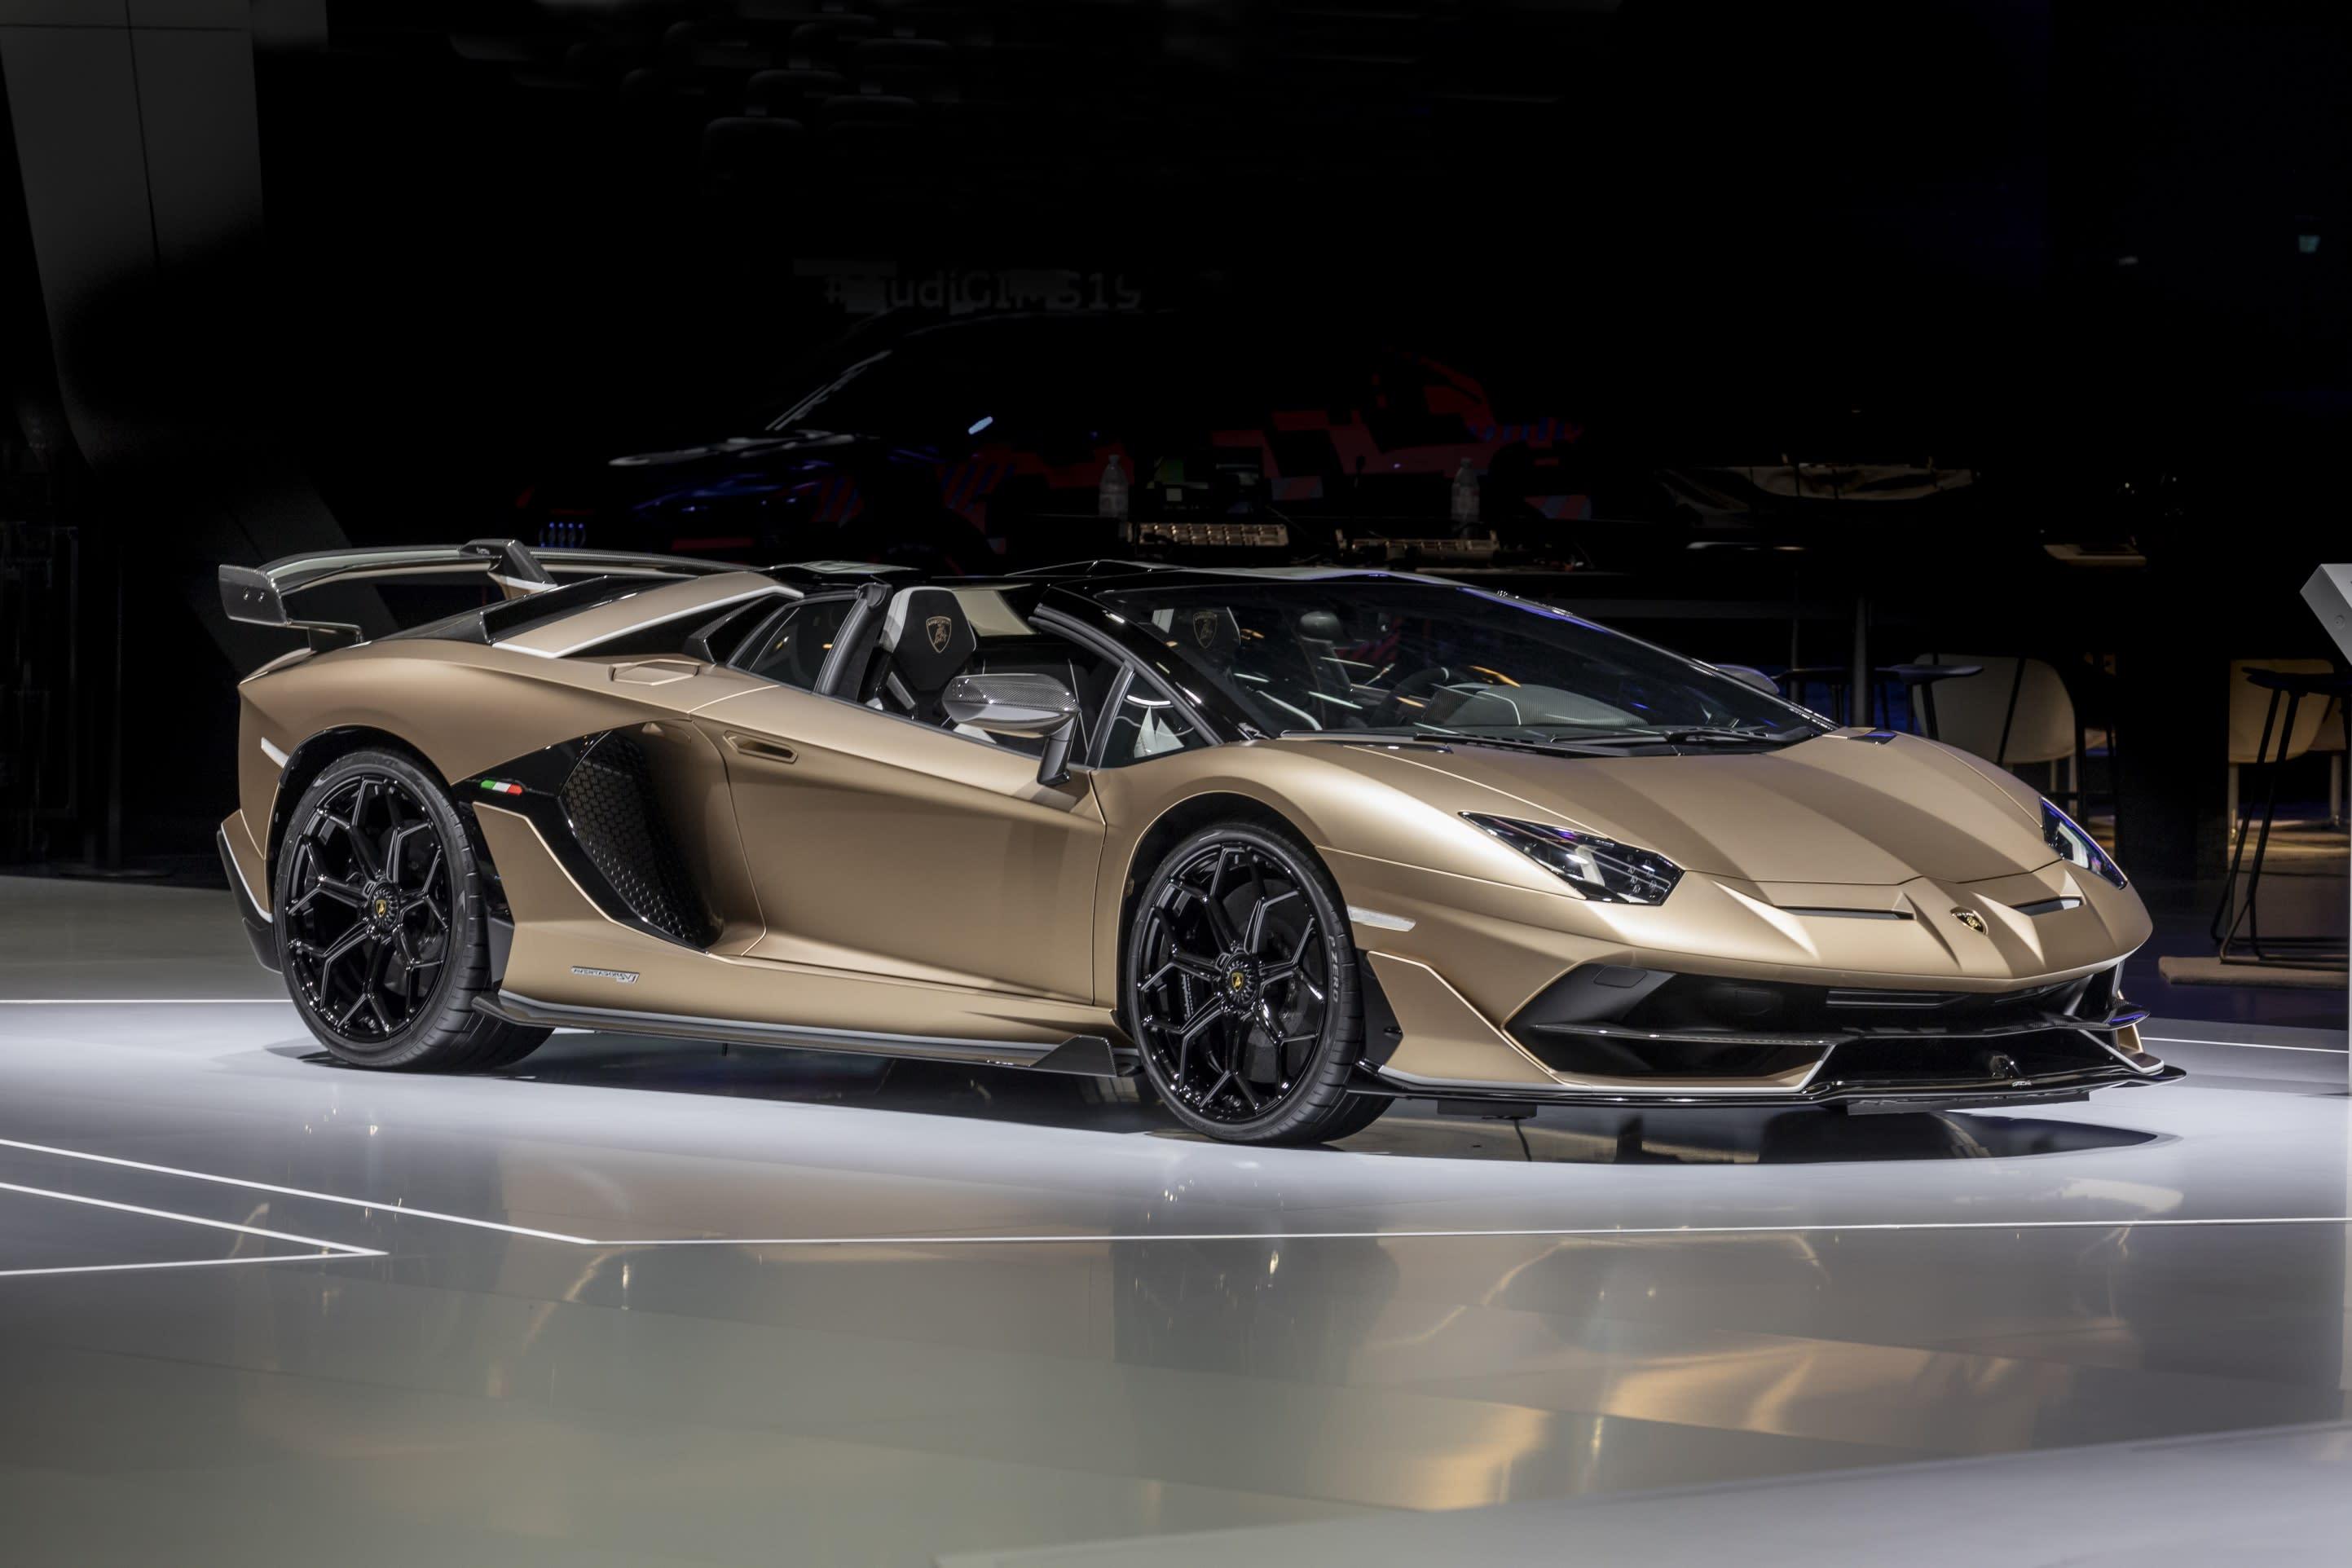 Geneva Motor Show Lamborghini reveals the Aventador SVJ